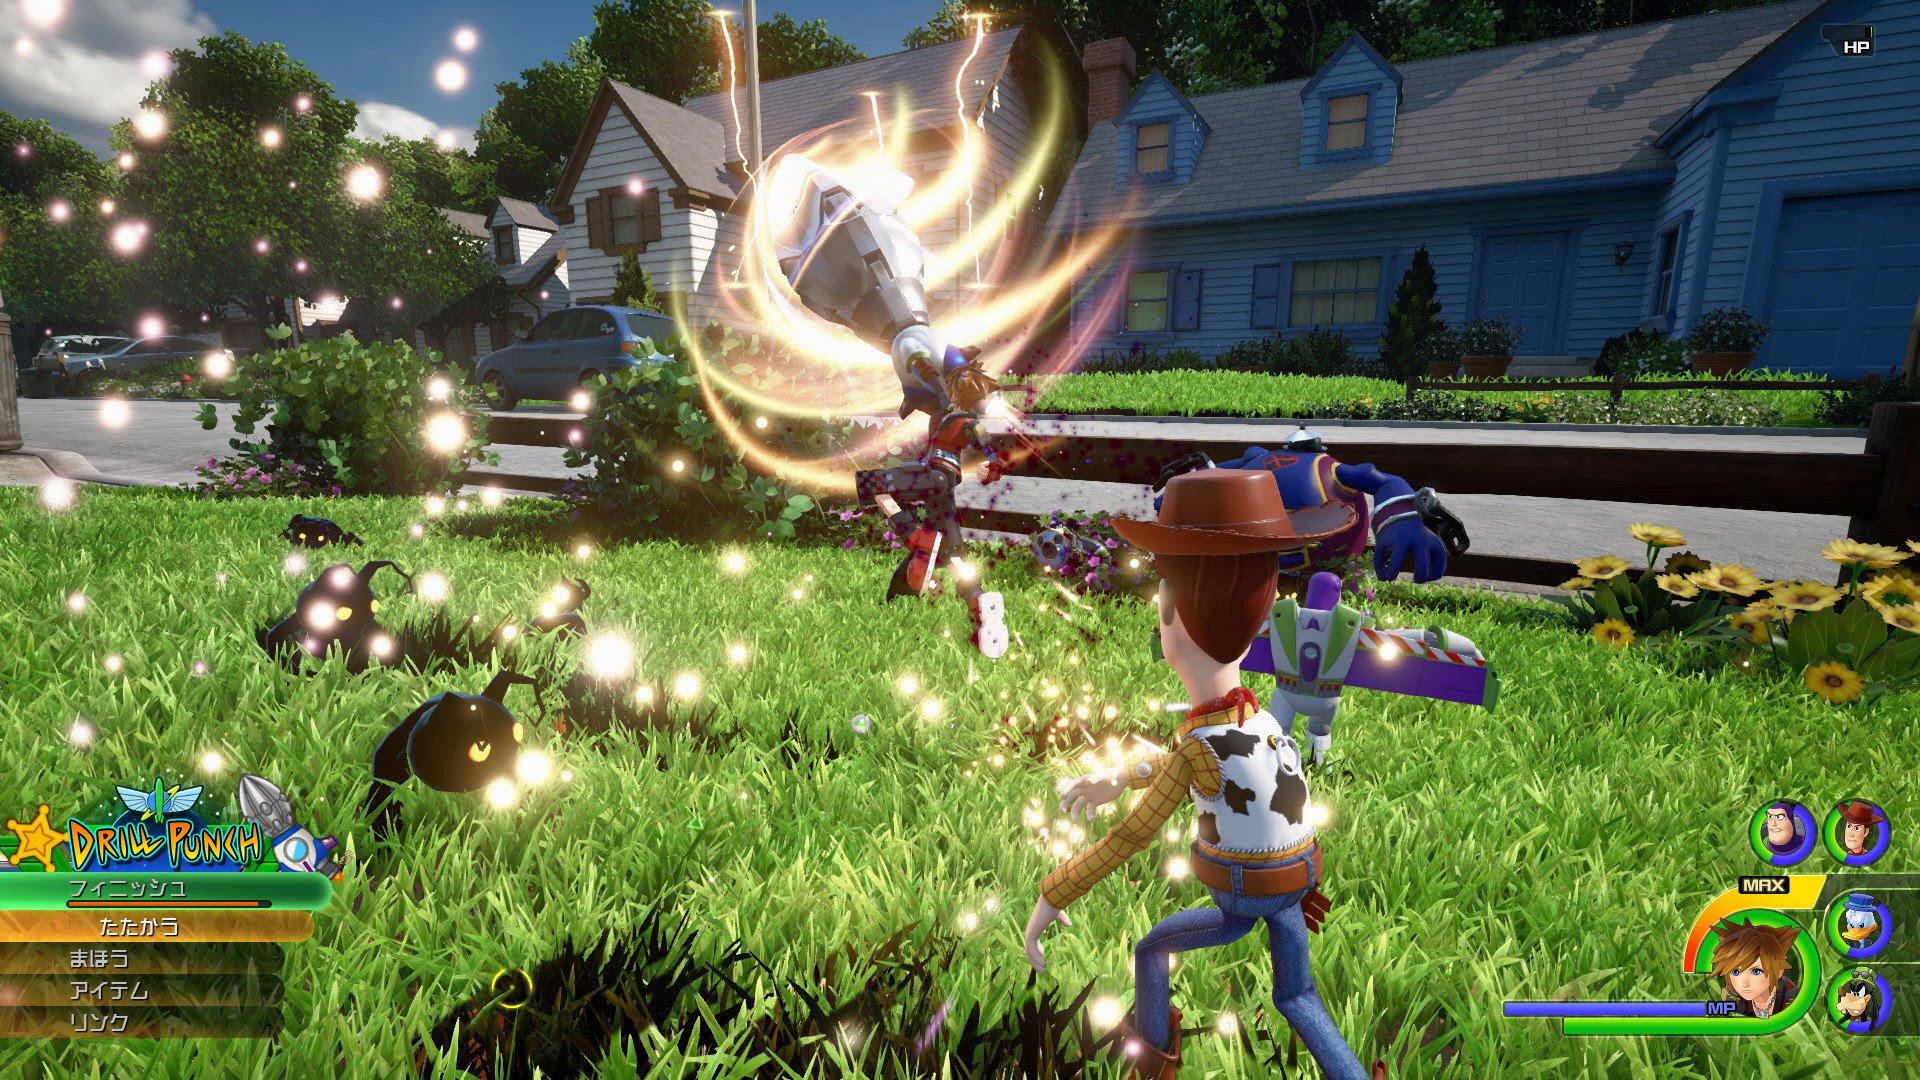 New screens showcase Kingdom Hearts 3's beautiful engine screenshot